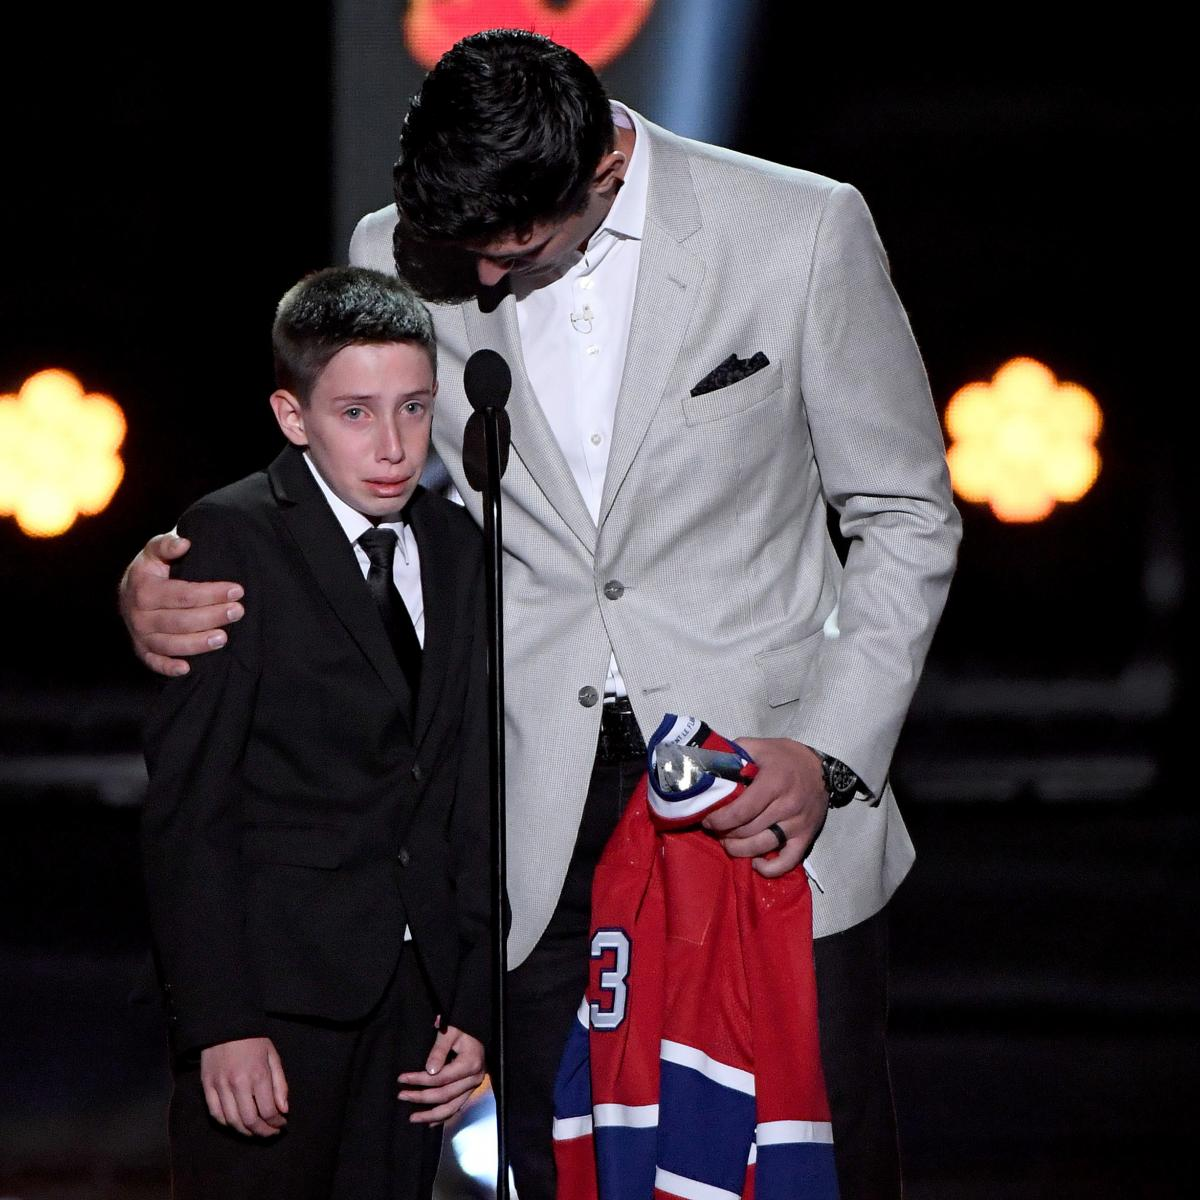 Camille Kostek Latest News: Video: Canadiens' Carey Price Surprises Fan Anderson